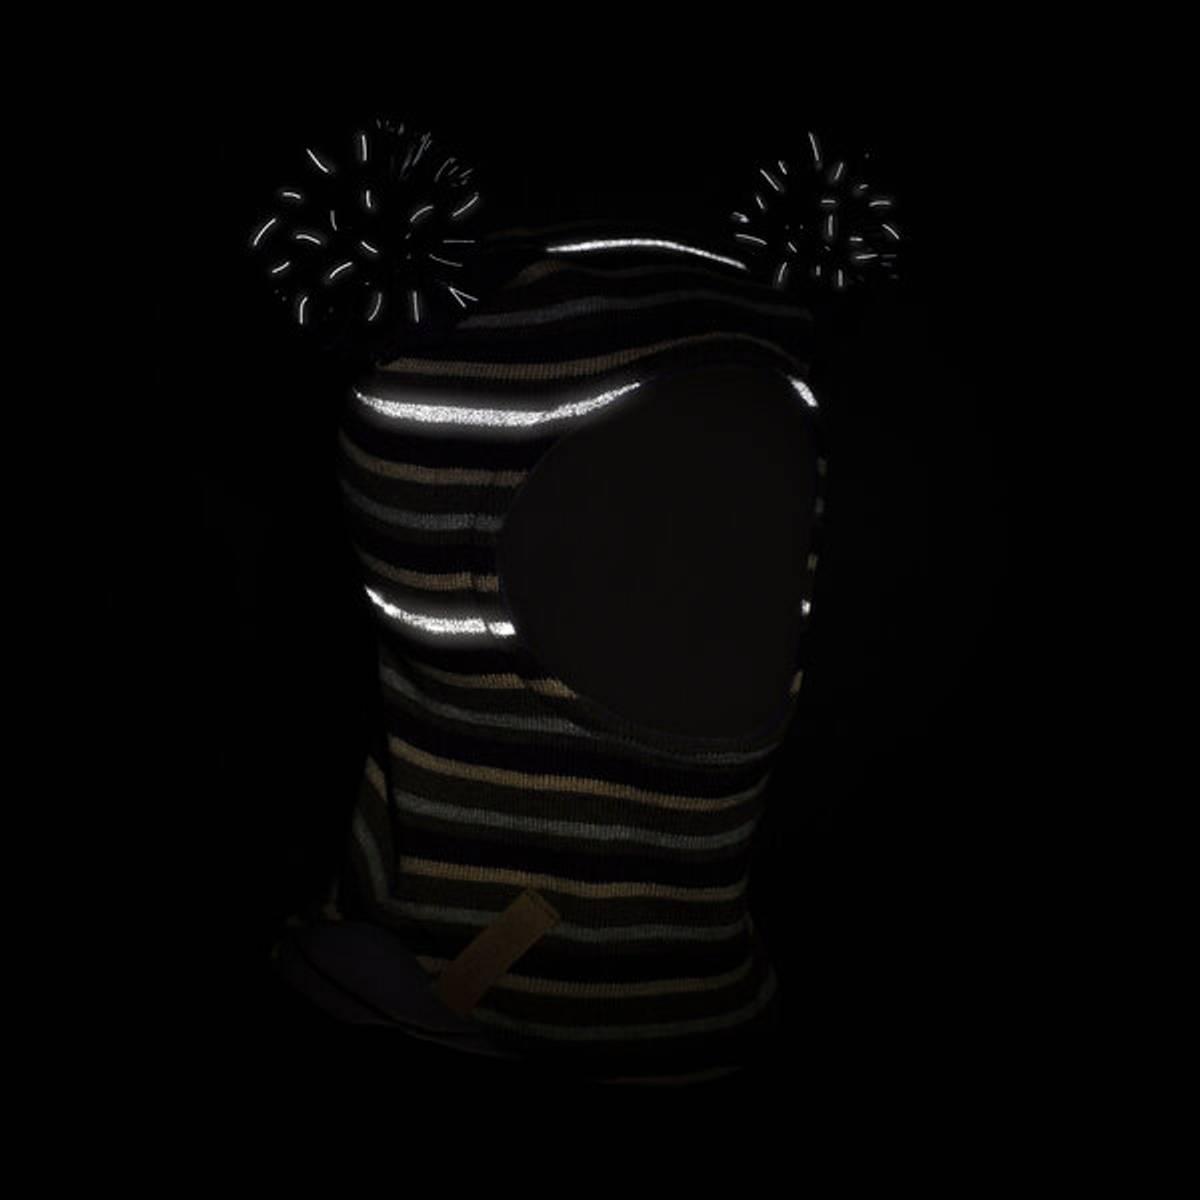 Morild Fonn balaklava med refleks, fiolett